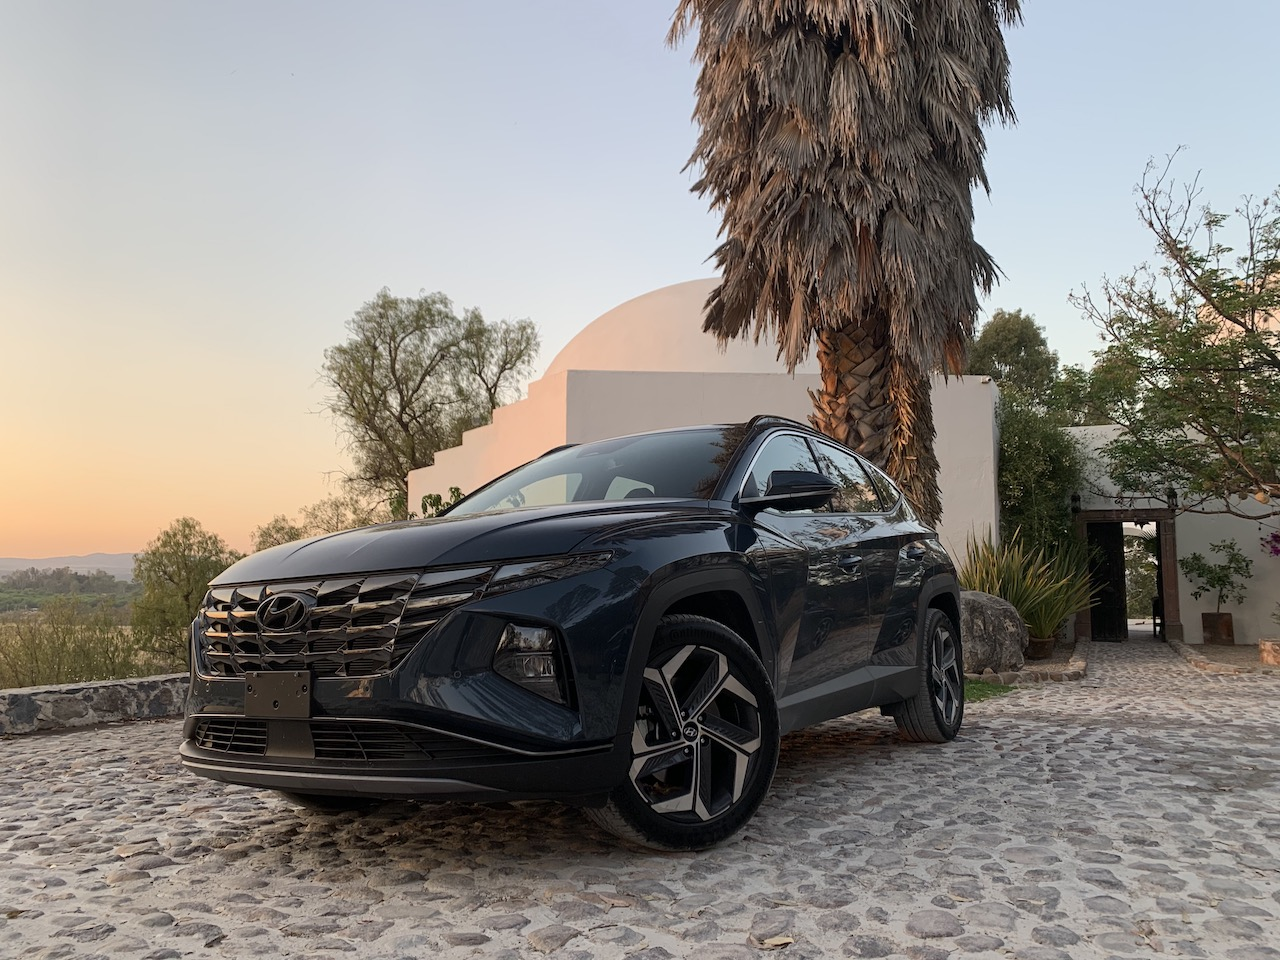 Prueba Hyundai Tucson 2022: poderosa y futurista